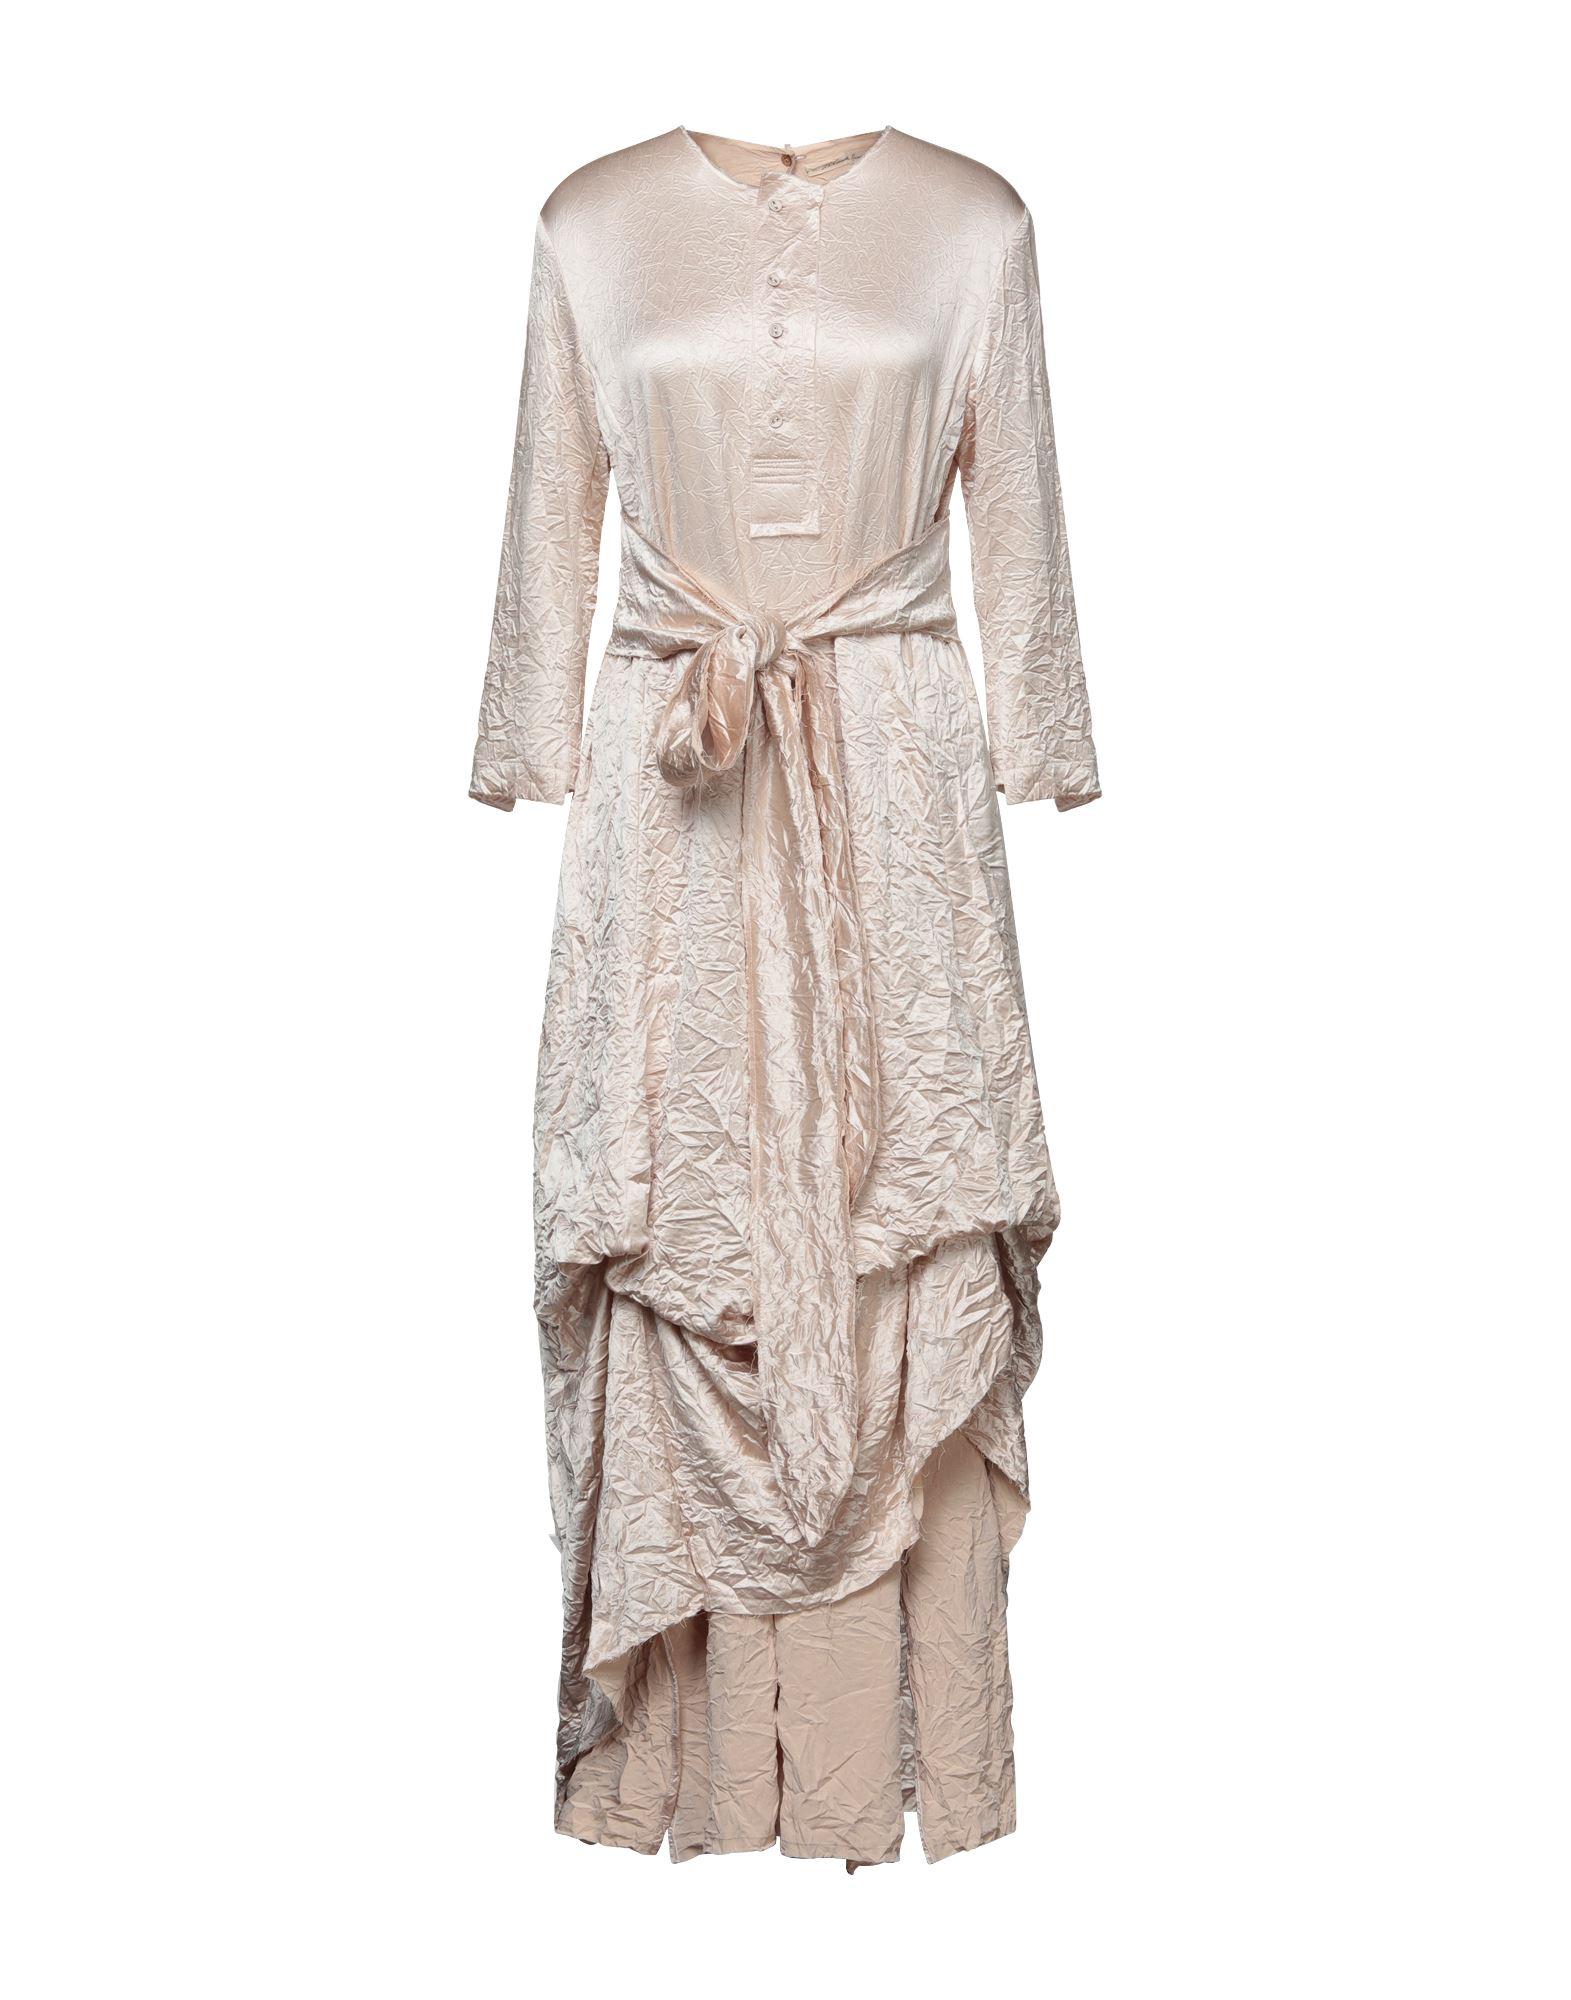 Aleksandr Manamïs Midi Dresses In Light Pink